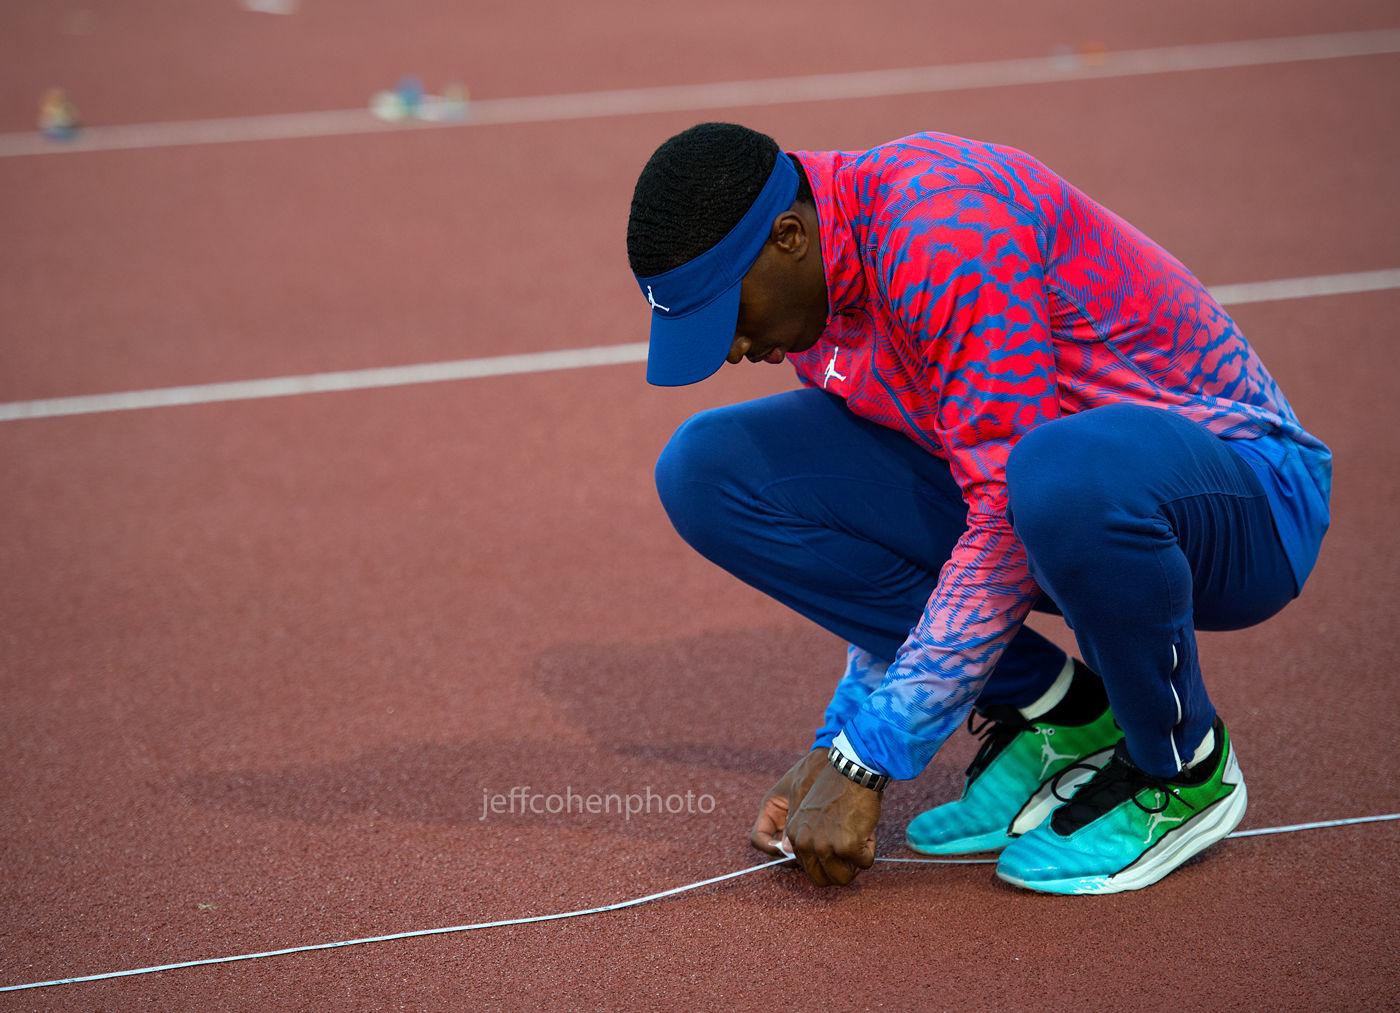 1r2016_athletissima_lausanne_erik_kynard_hj_jeff_cohen_photo_798_web.jpg